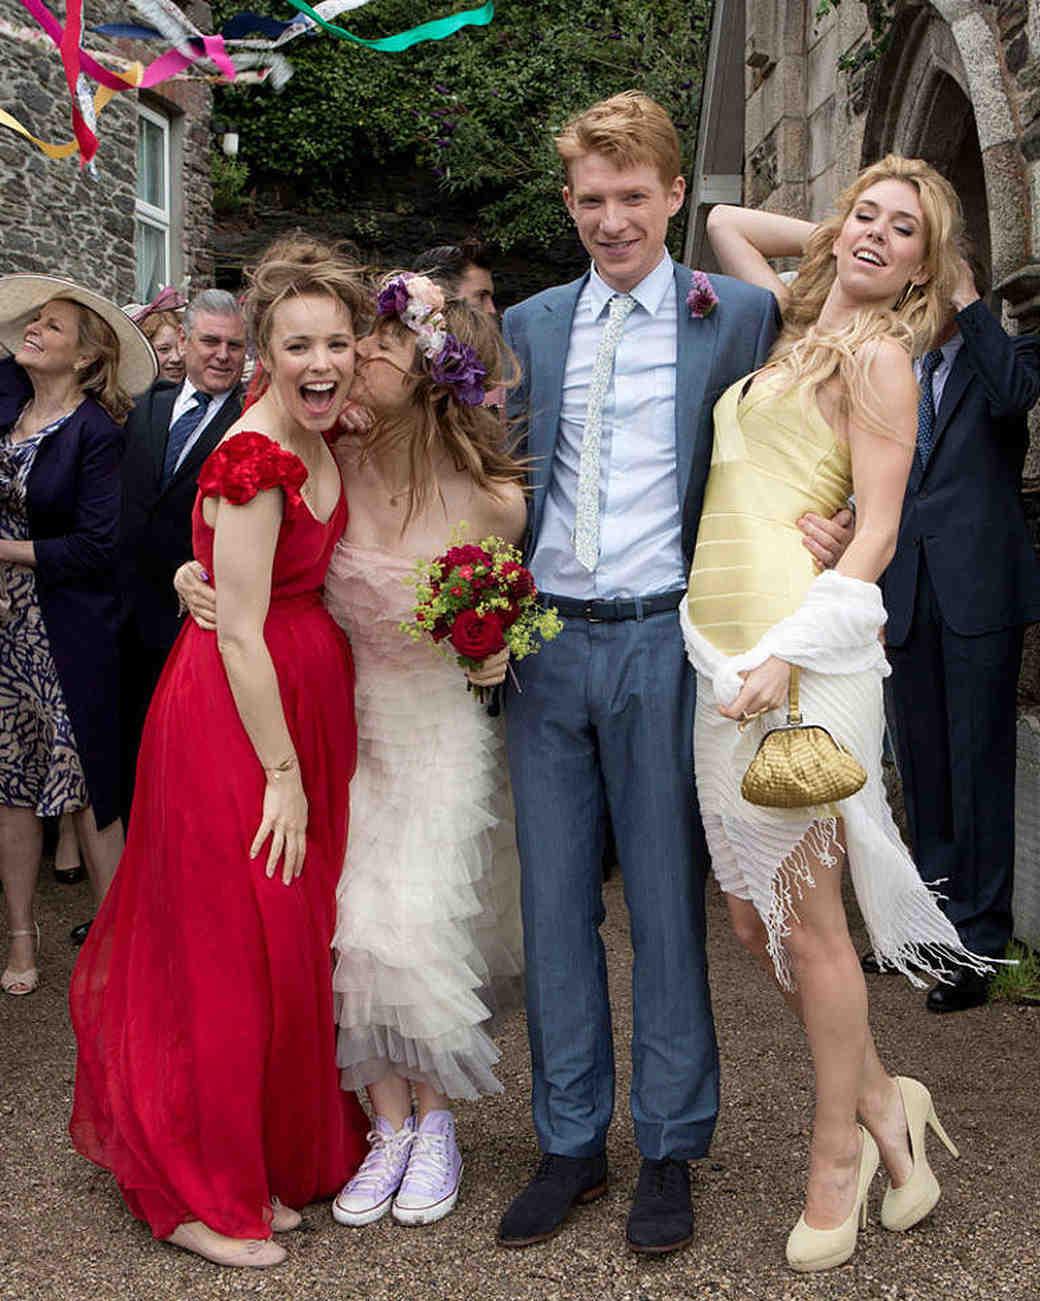 movie-wedding-dresses-about-time-rachel-mcadams-red-0316.jpg